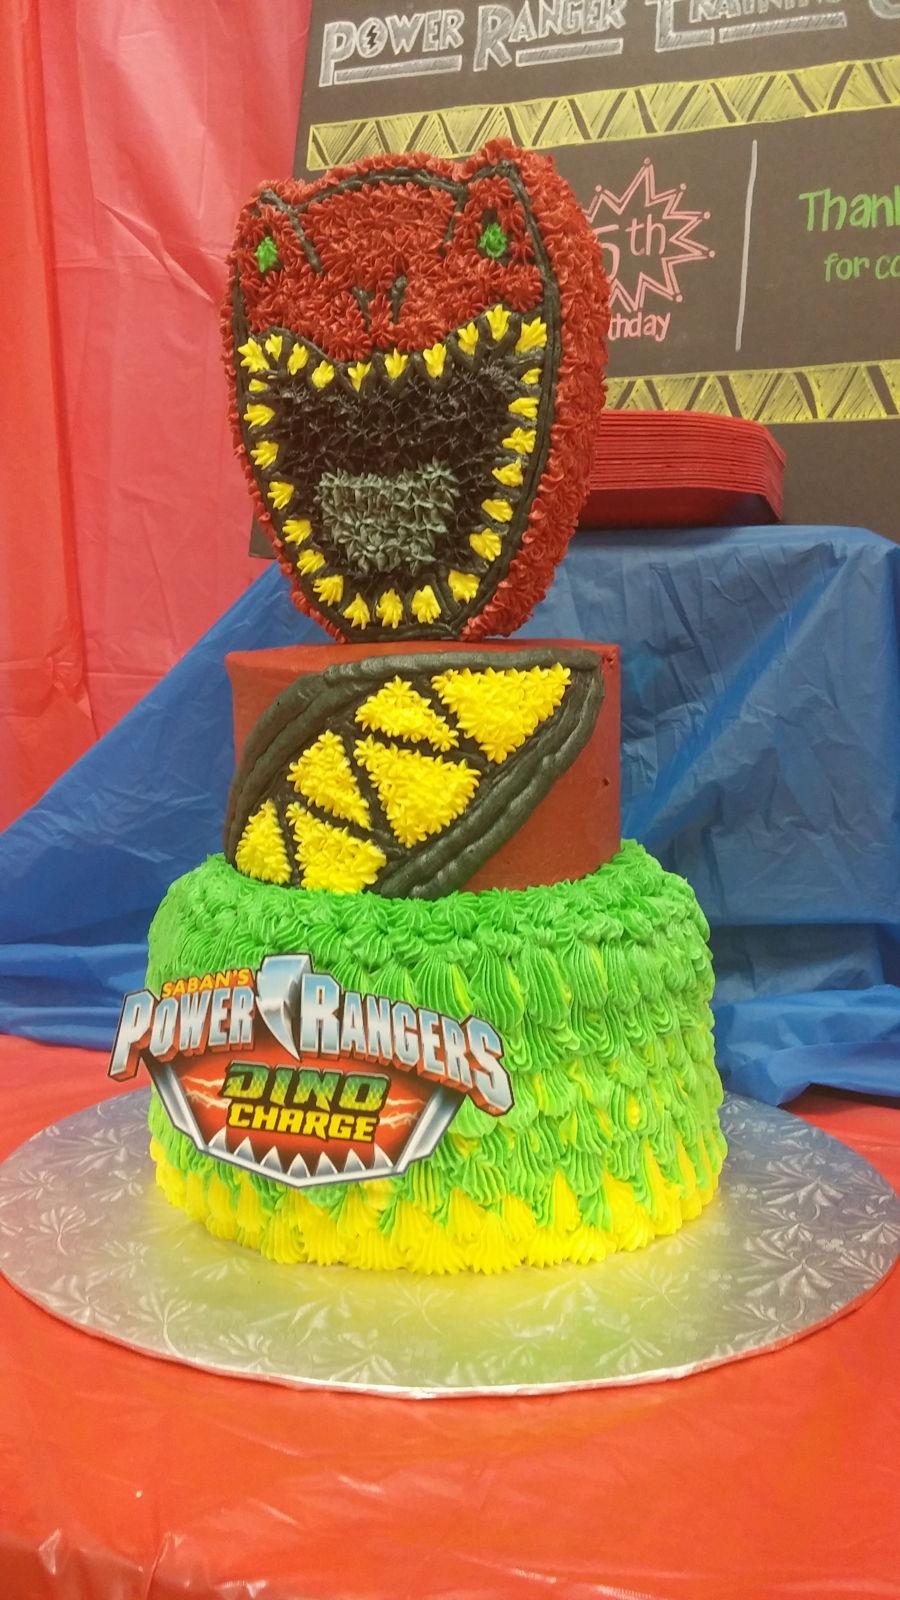 Power Rangers Dino Charge Cake